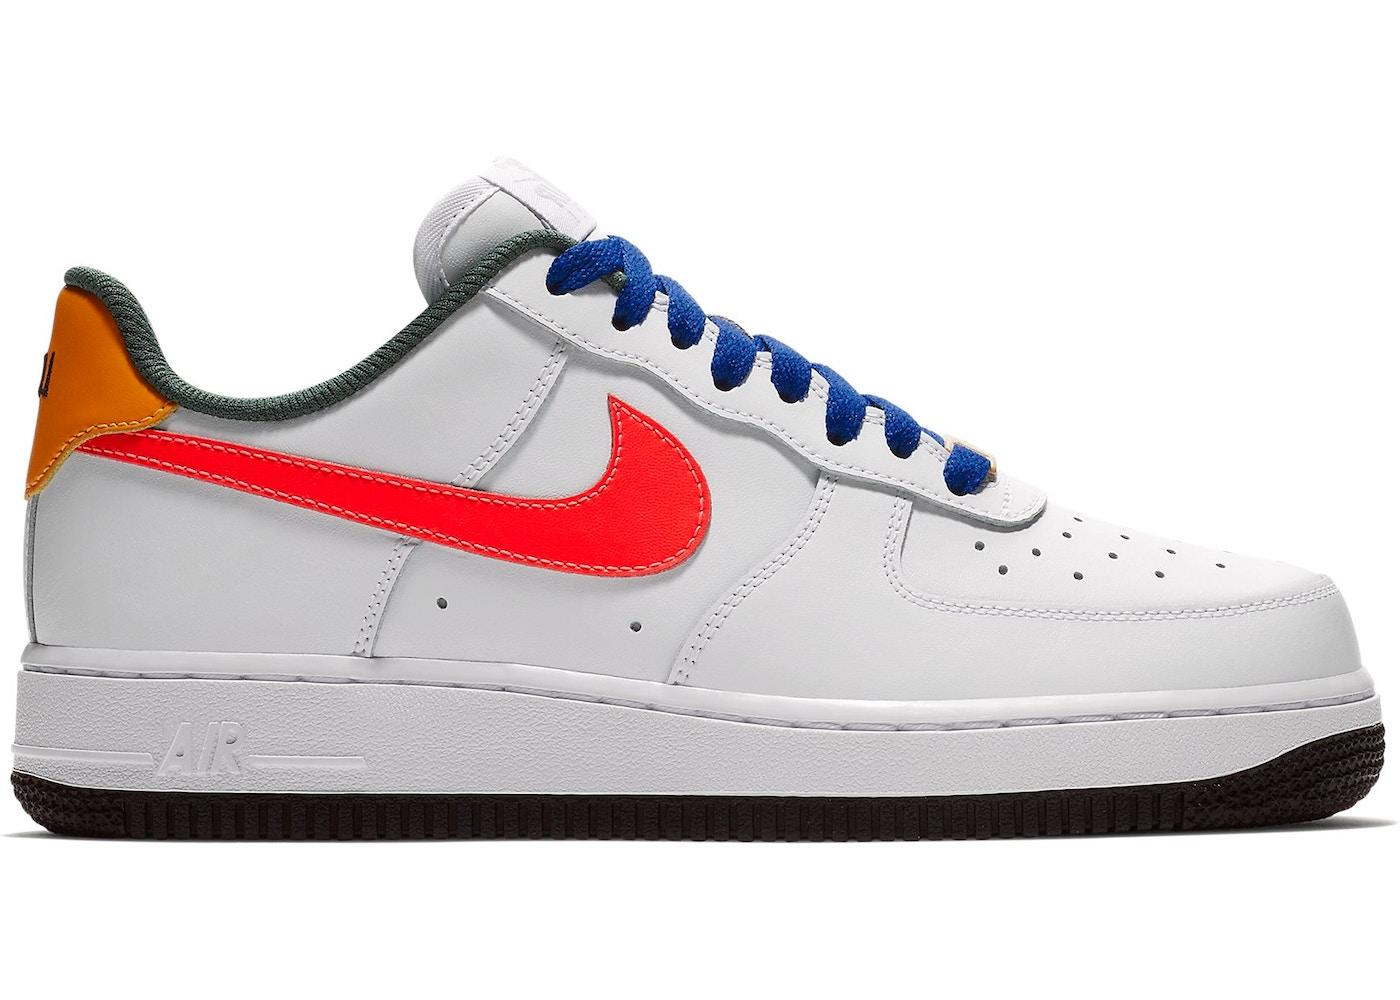 sale retailer f4b3f 5b465 Nike Air Force Shoes - Volatility